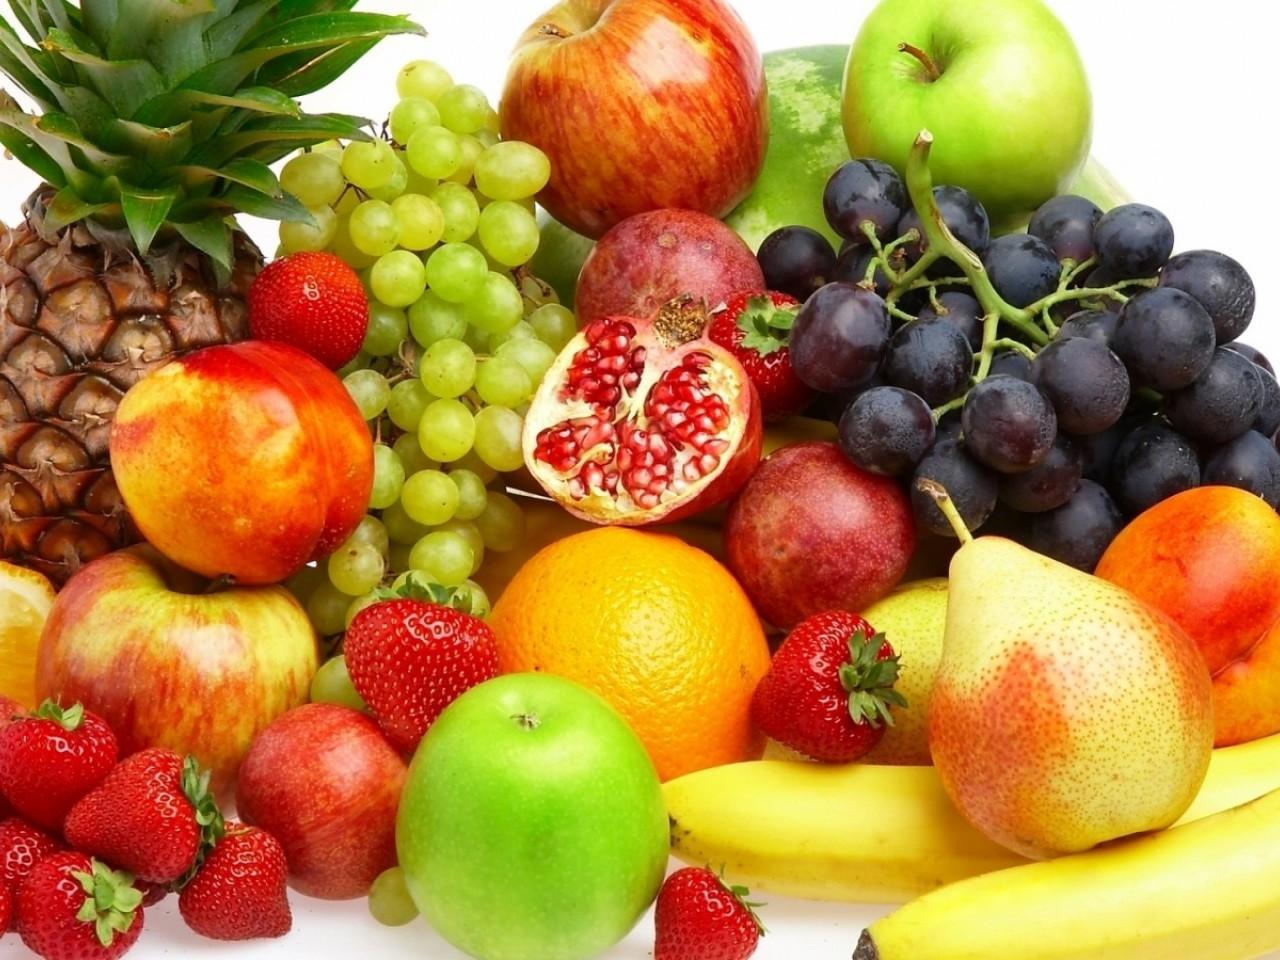 http://3.bp.blogspot.com/-TzWiREFovHI/T92WNMMpq6I/AAAAAAAAAcM/sy9a5Pyyogg/s1600/all-fruits-1280x960.jpg